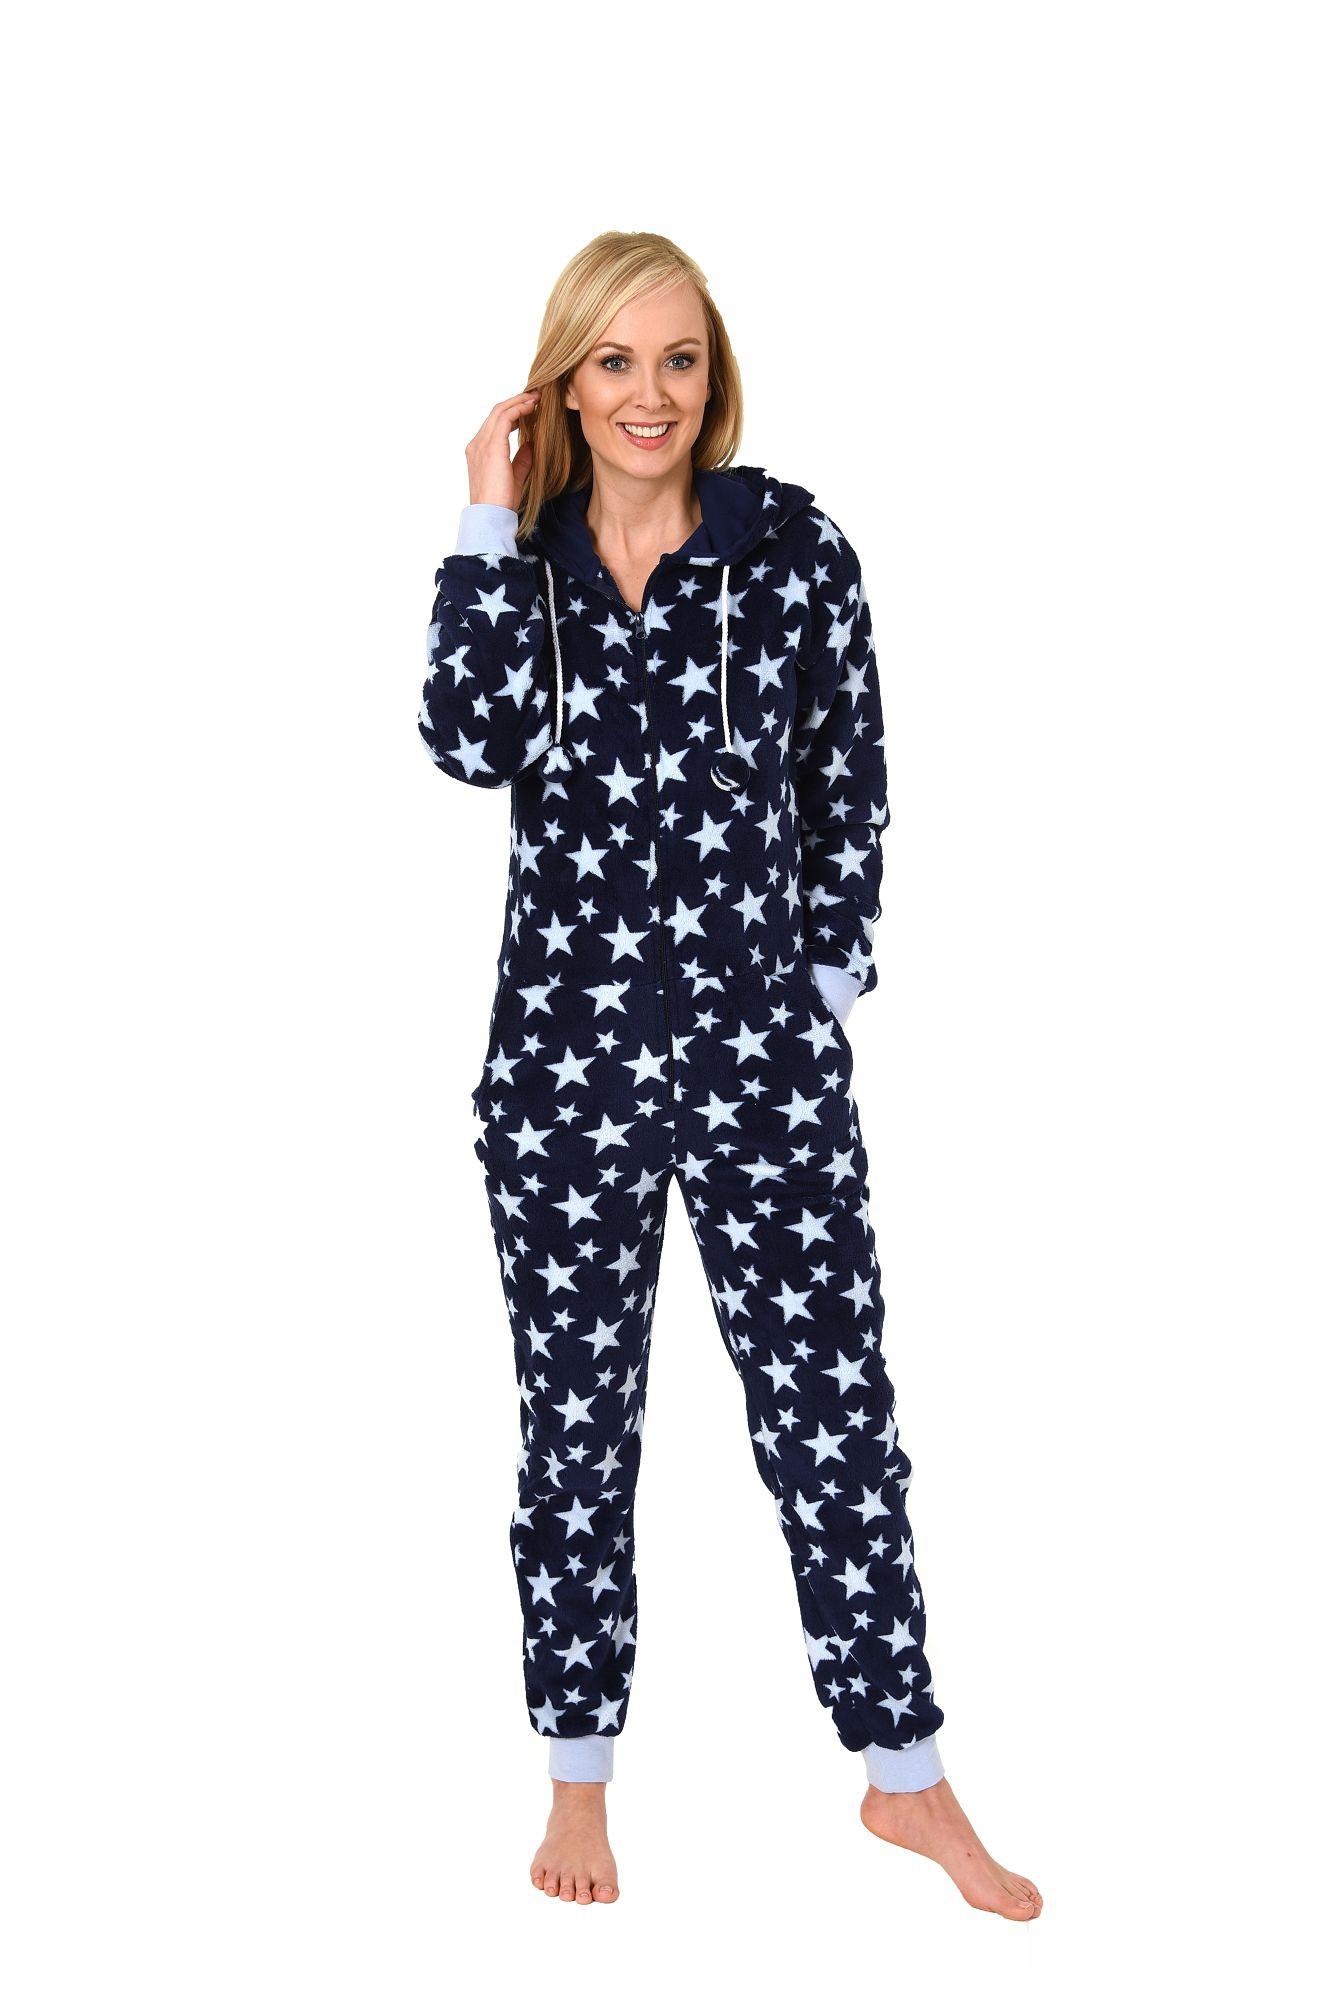 68af61d095f9de Damen Schlafanzug Einteiler Jumpsuit Onesie Overall langarm im coolen Look–  267 97 004